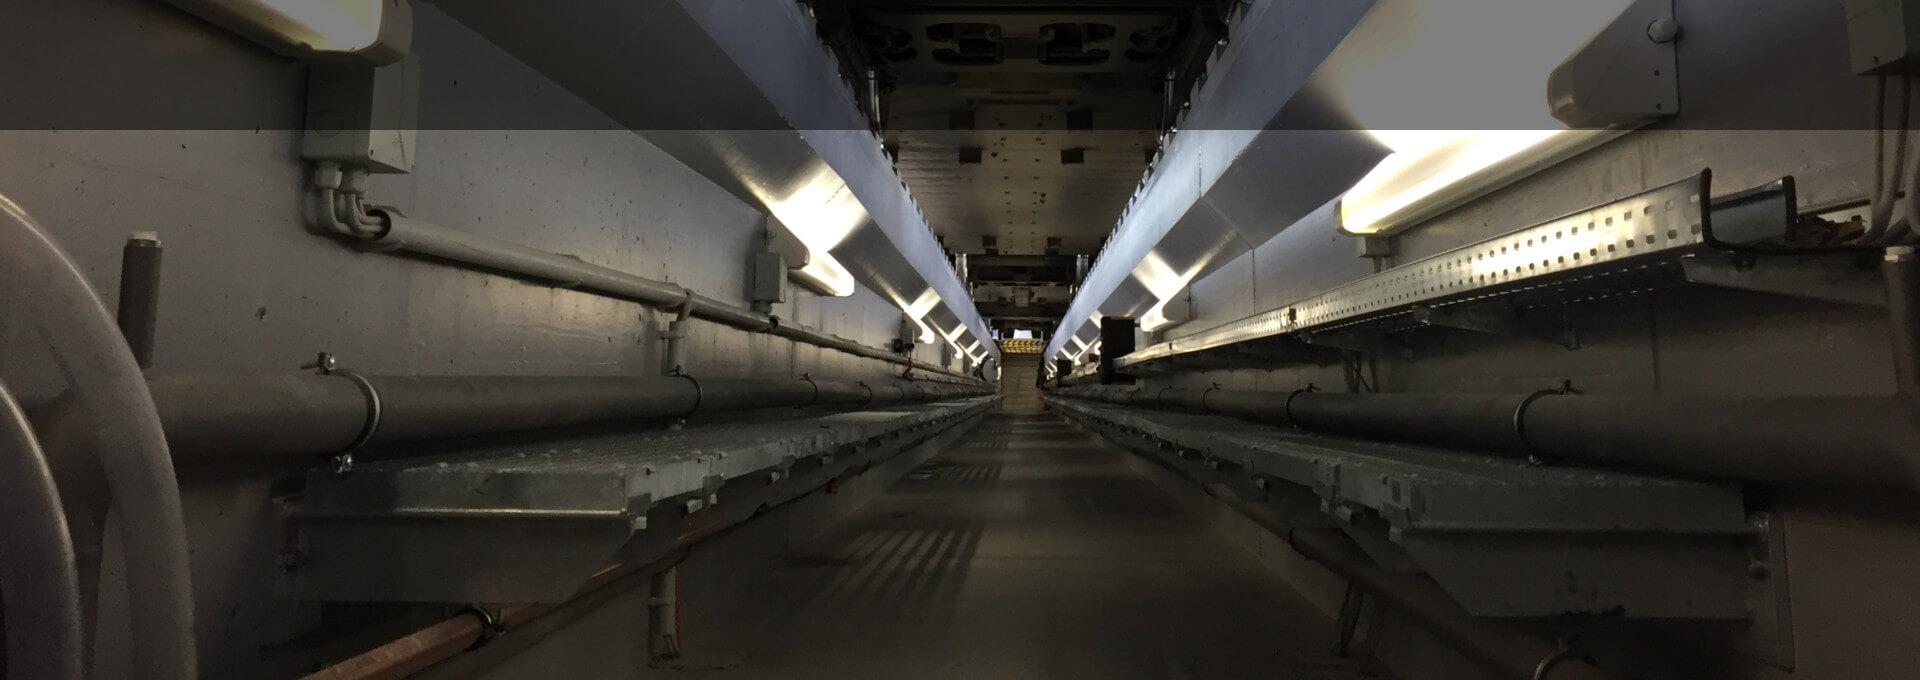 DB-Regio-Werkstatt-Muenster-NX